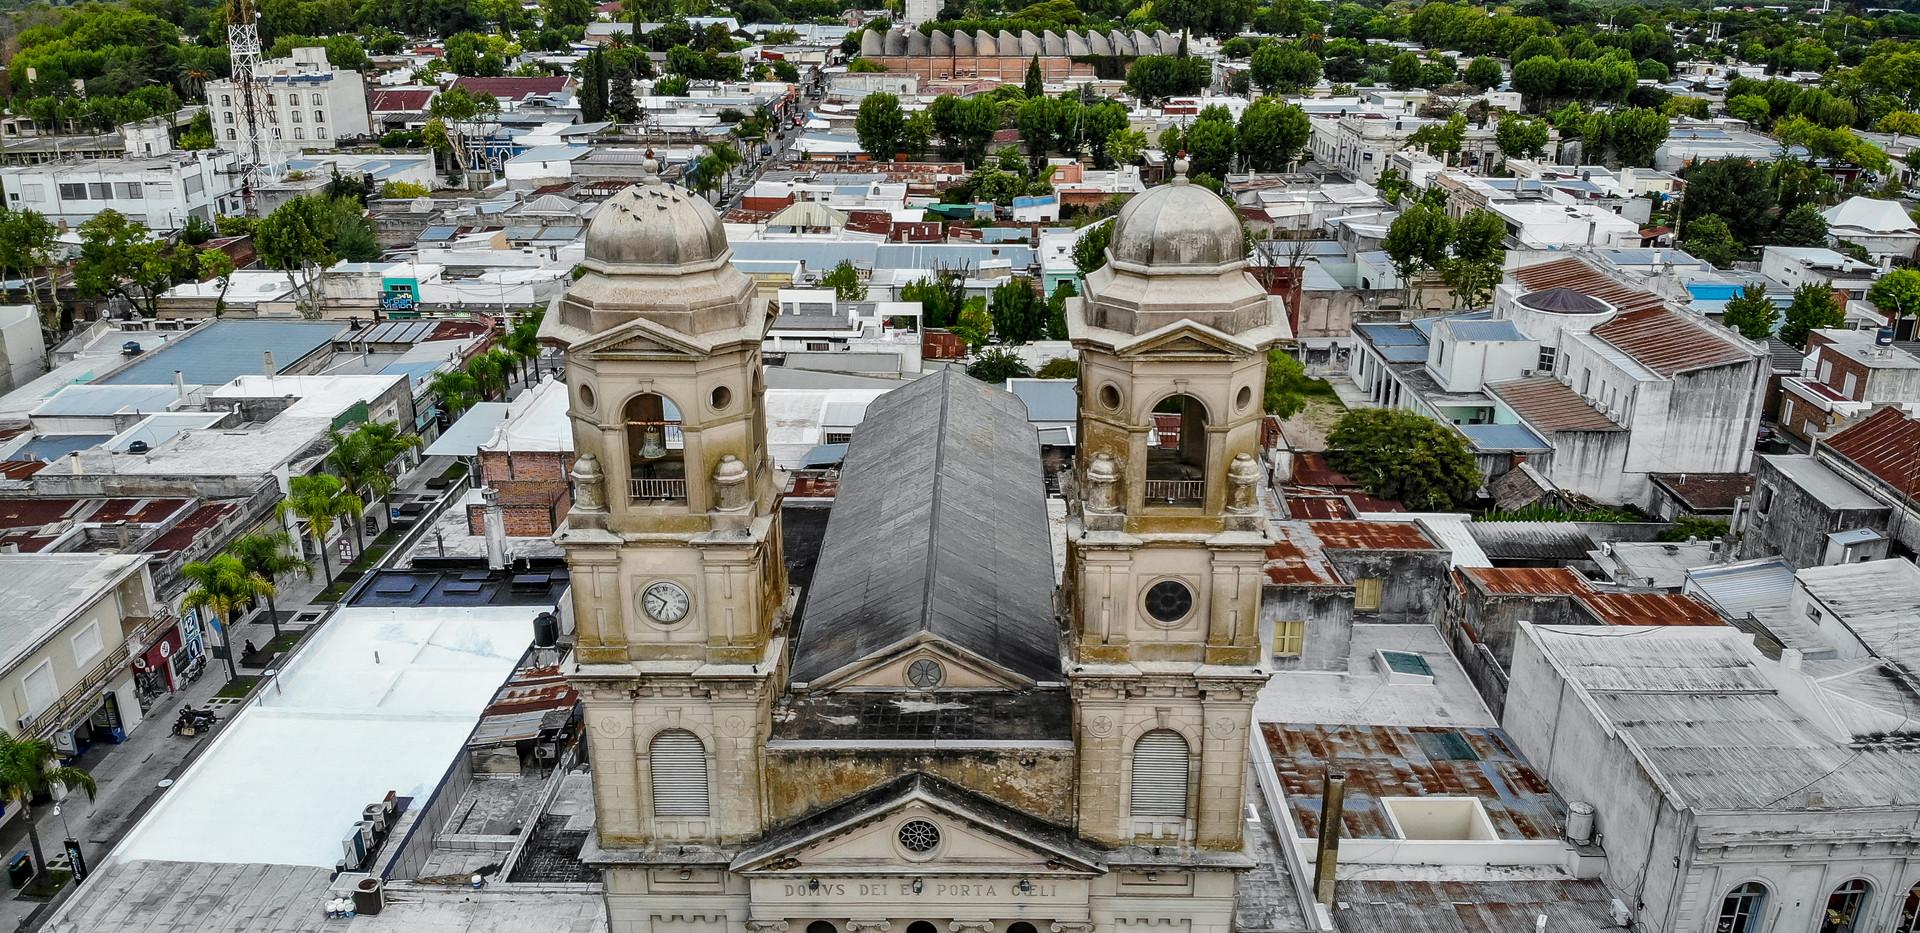 FLORES_Turismo x Javier Villasuso_2020_1